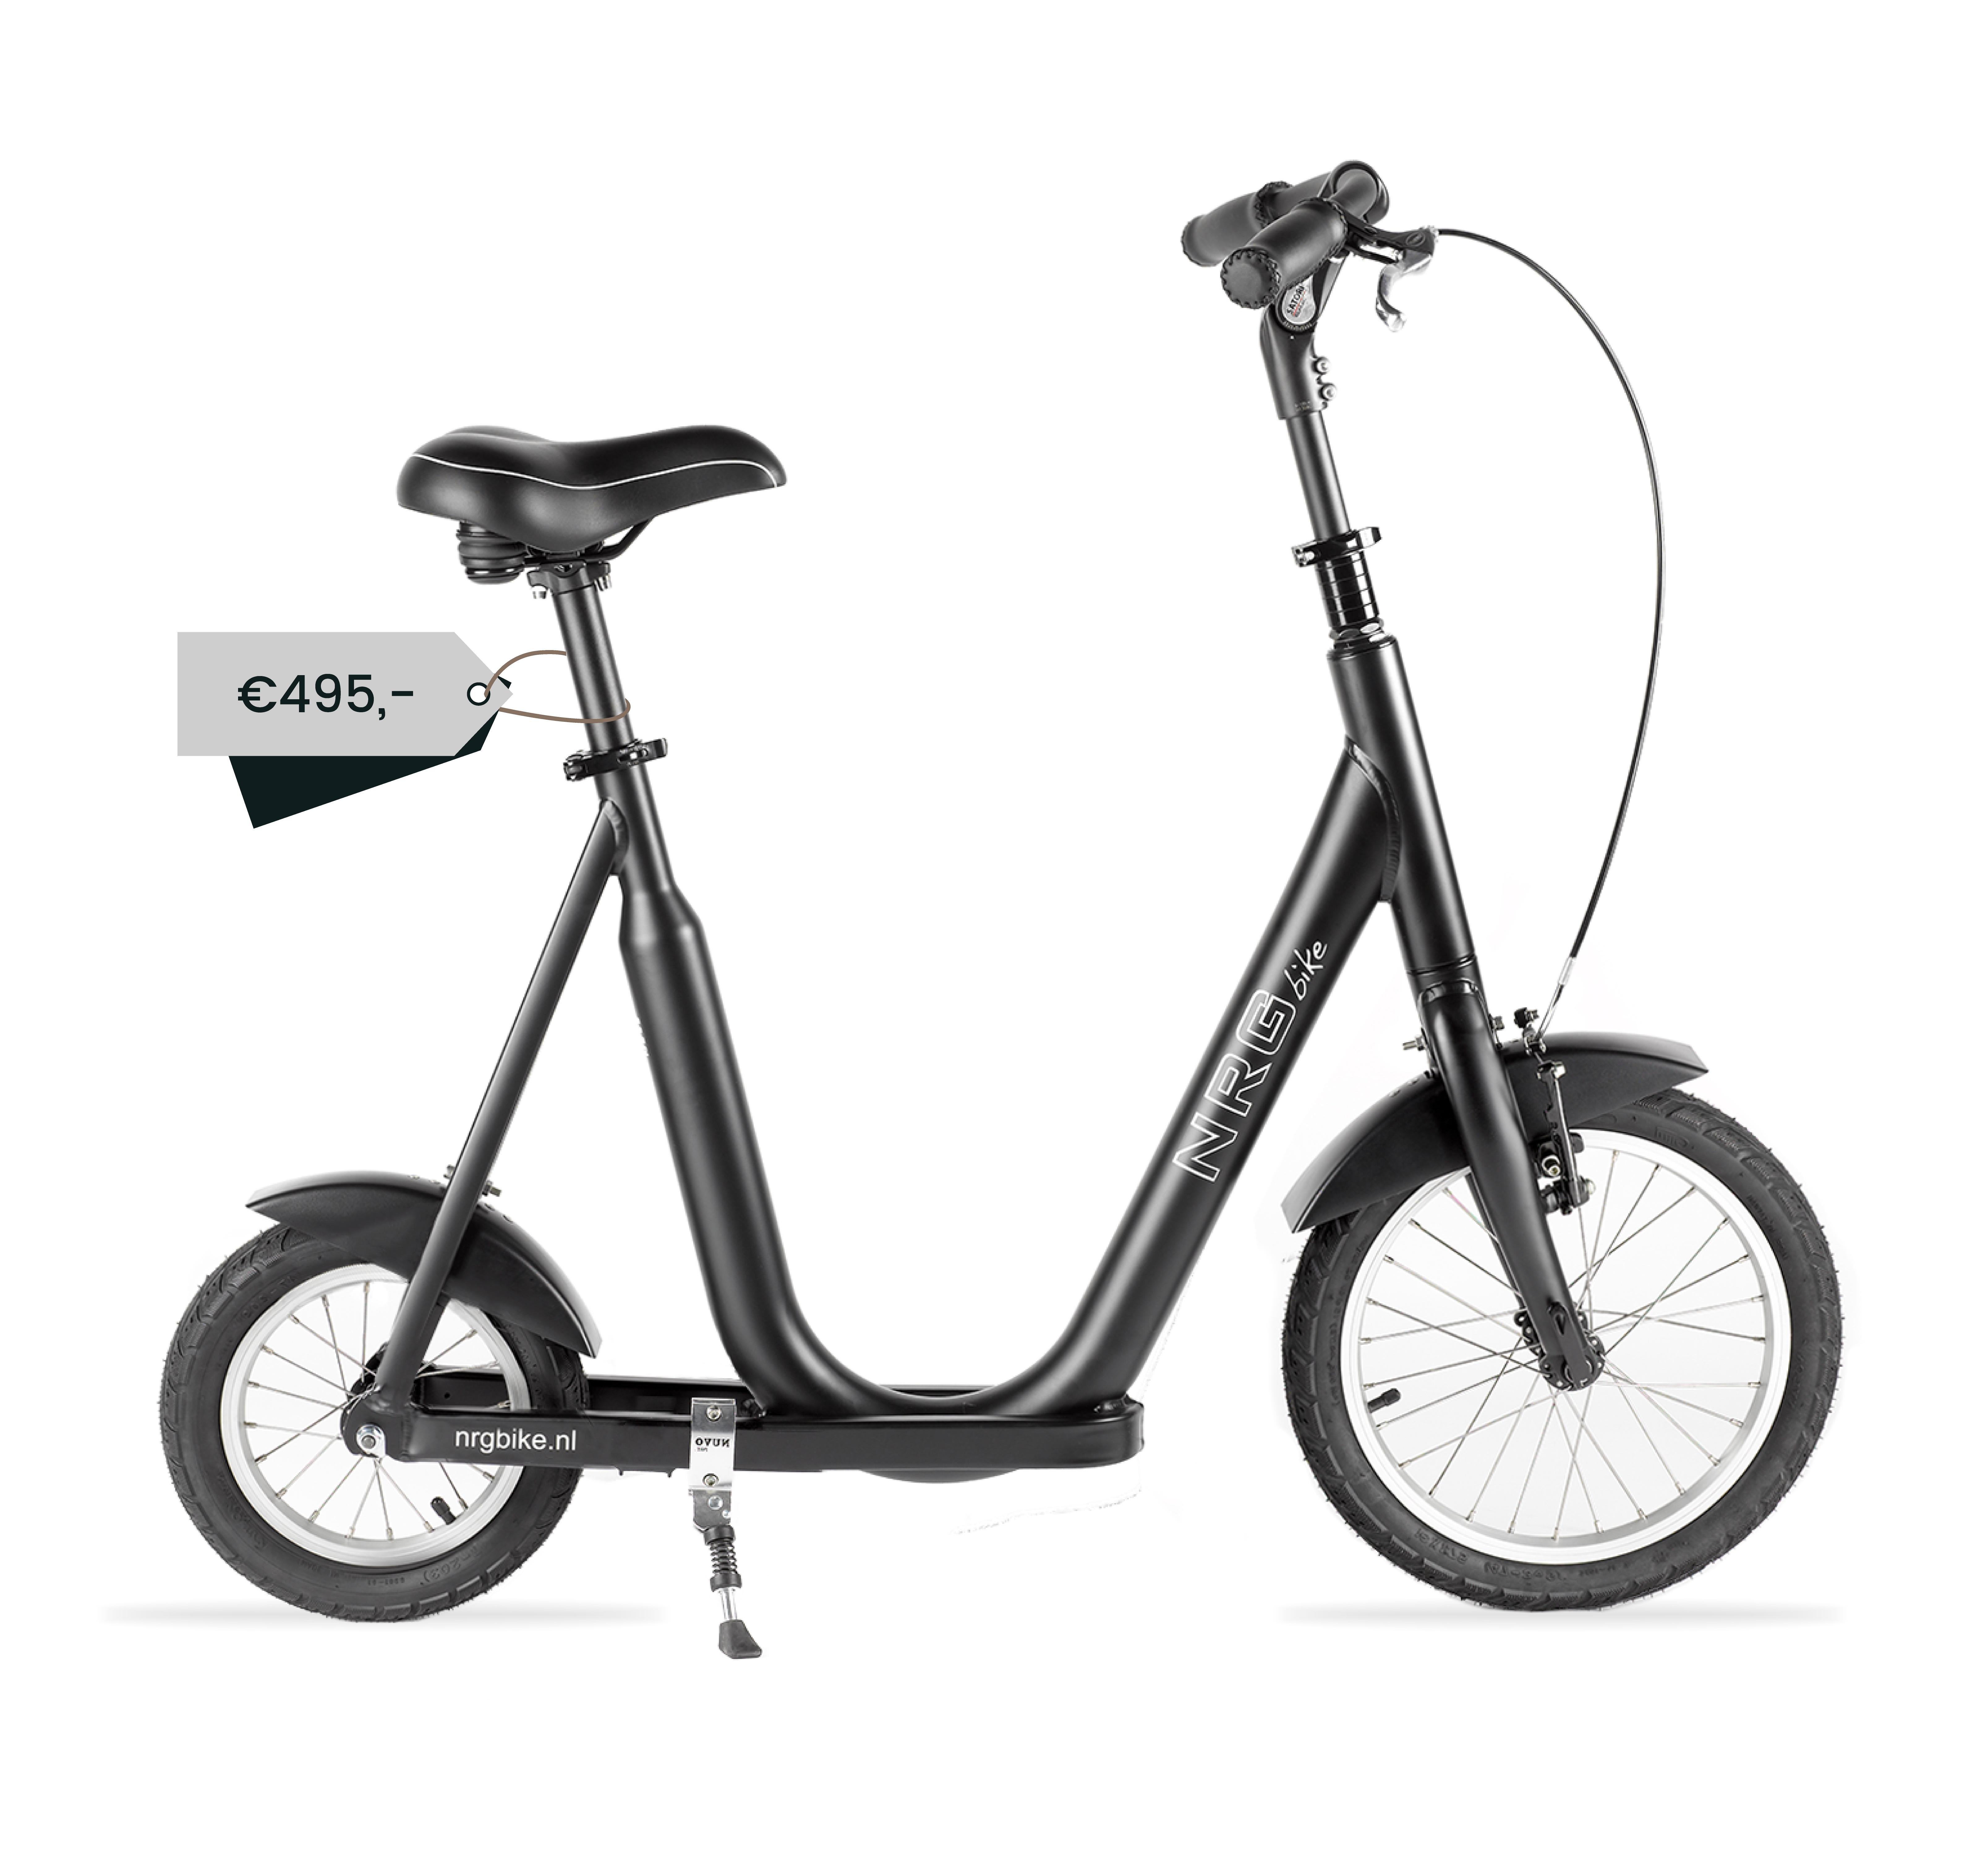 De NRGbike loopfiets kost €495